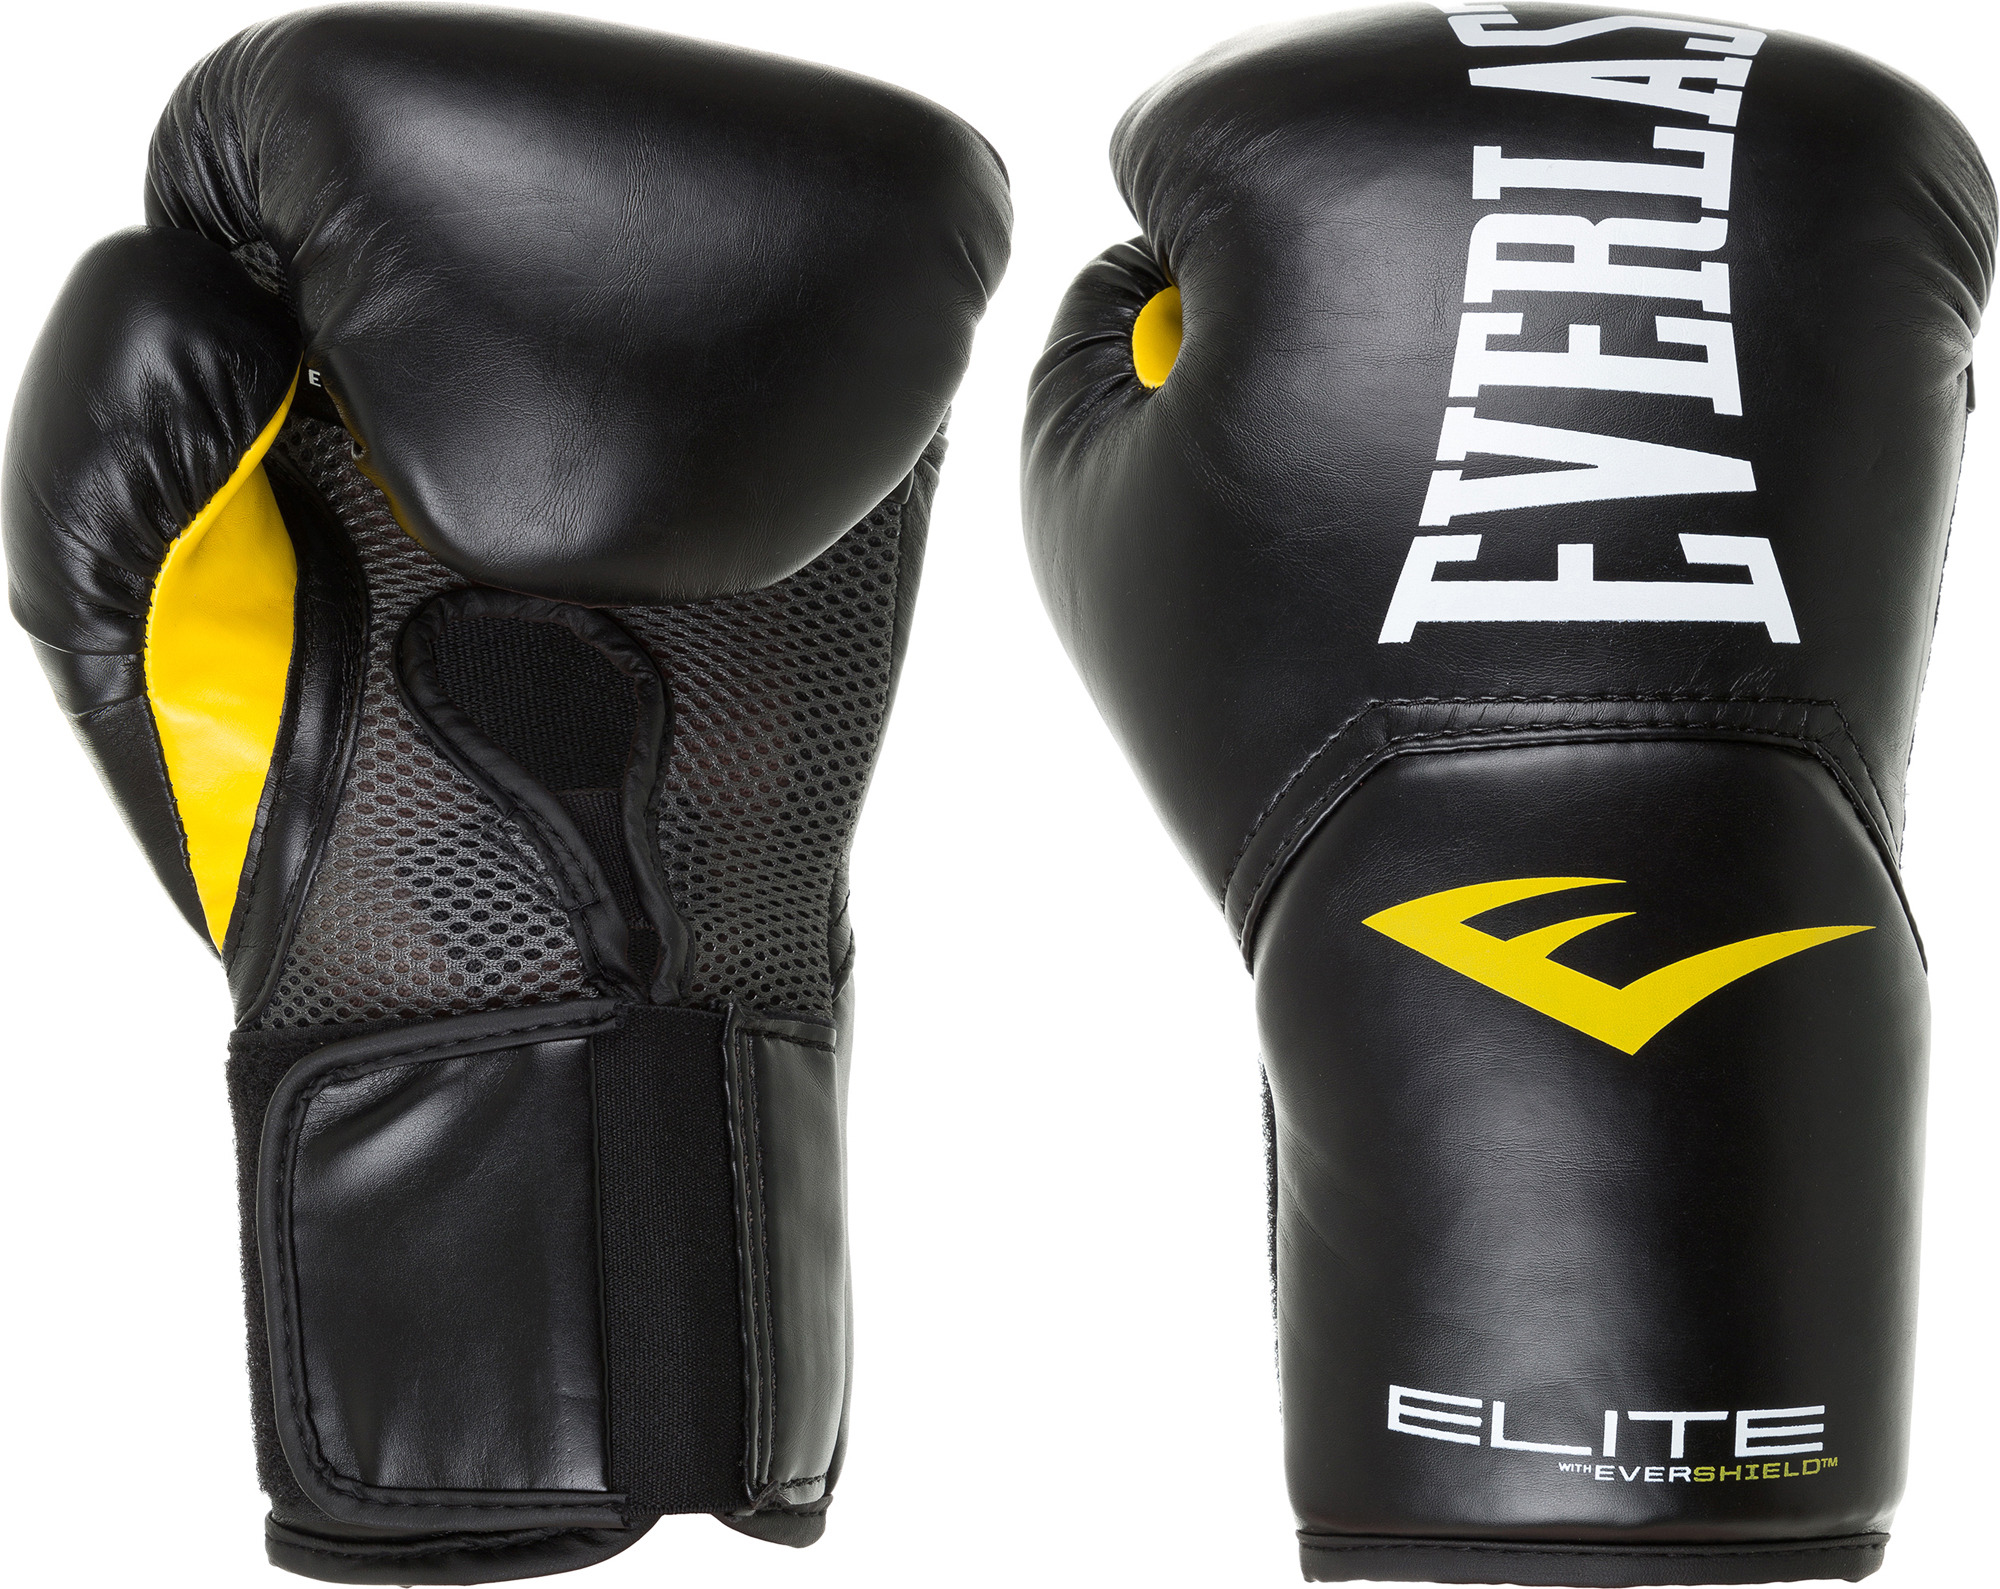 перчатки гелевые с бинтом everlast duster evergel цвет желтый длина бинта 150 см размер s m Everlast Перчатки боксерские Everlast Elite Pro style, размер 8